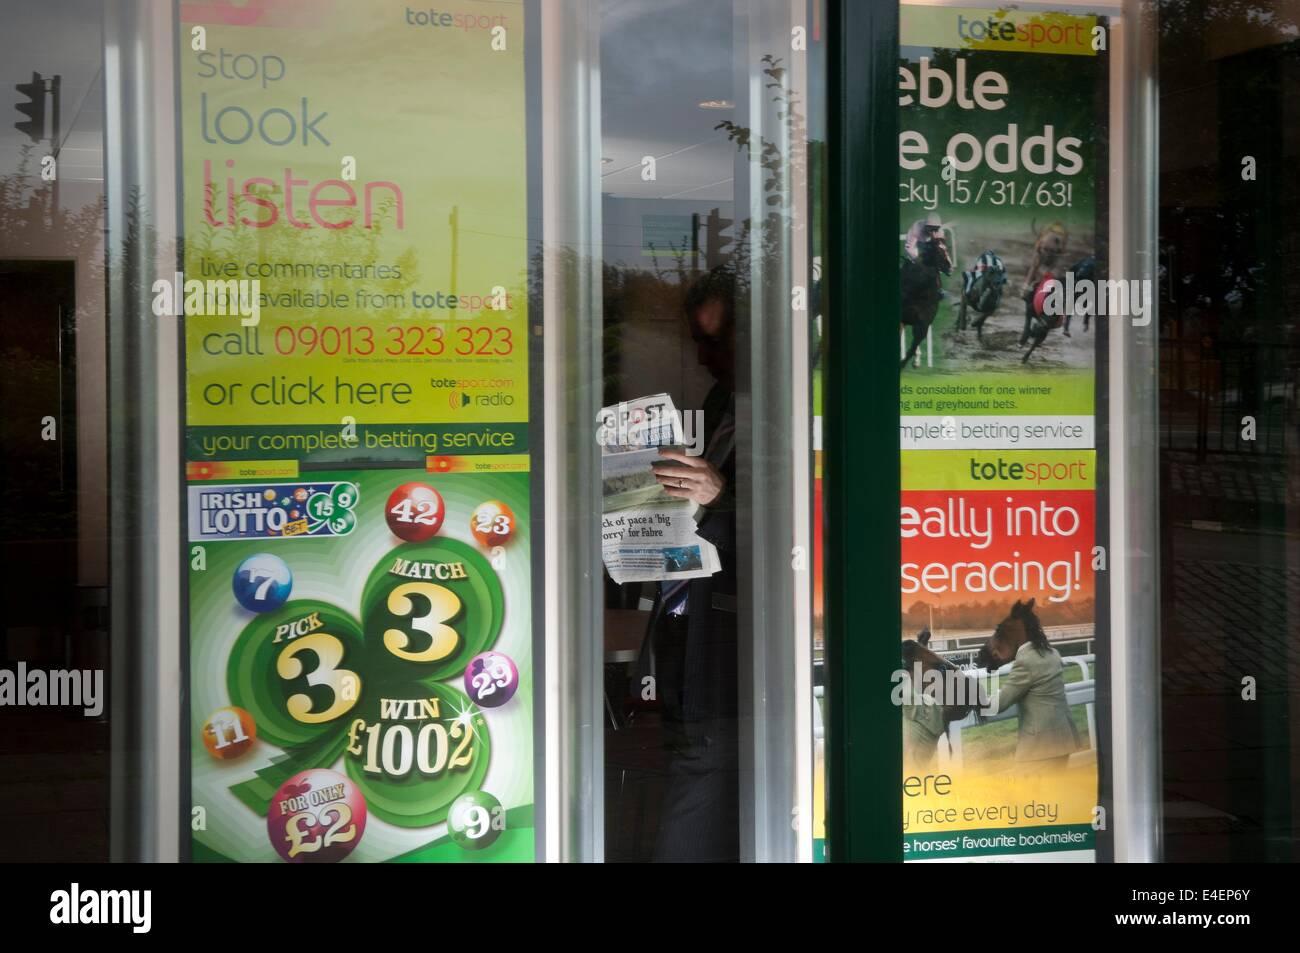 Totesport mobile betting station binary options buddy indicator warehouse